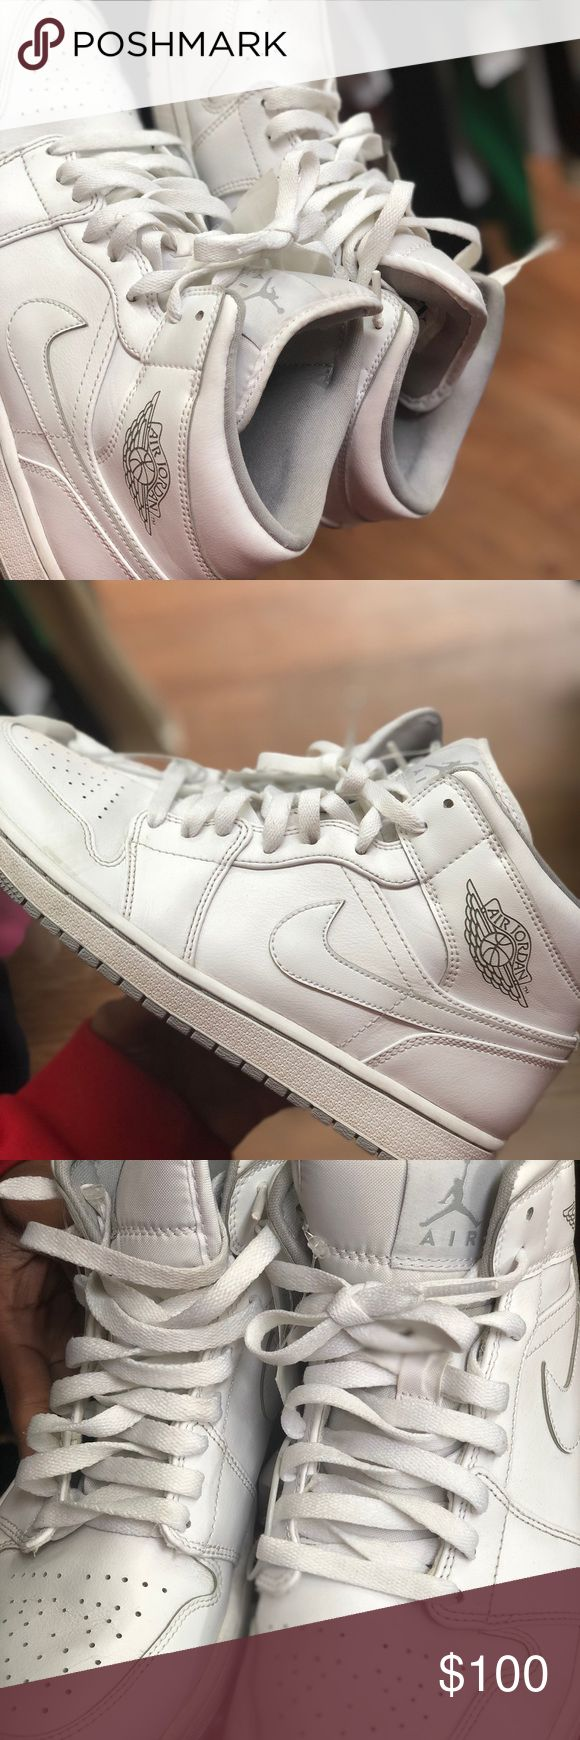 Jordan's size 9.5 All white Jordan 1s 9.5 Jordan Shoes Sneakers